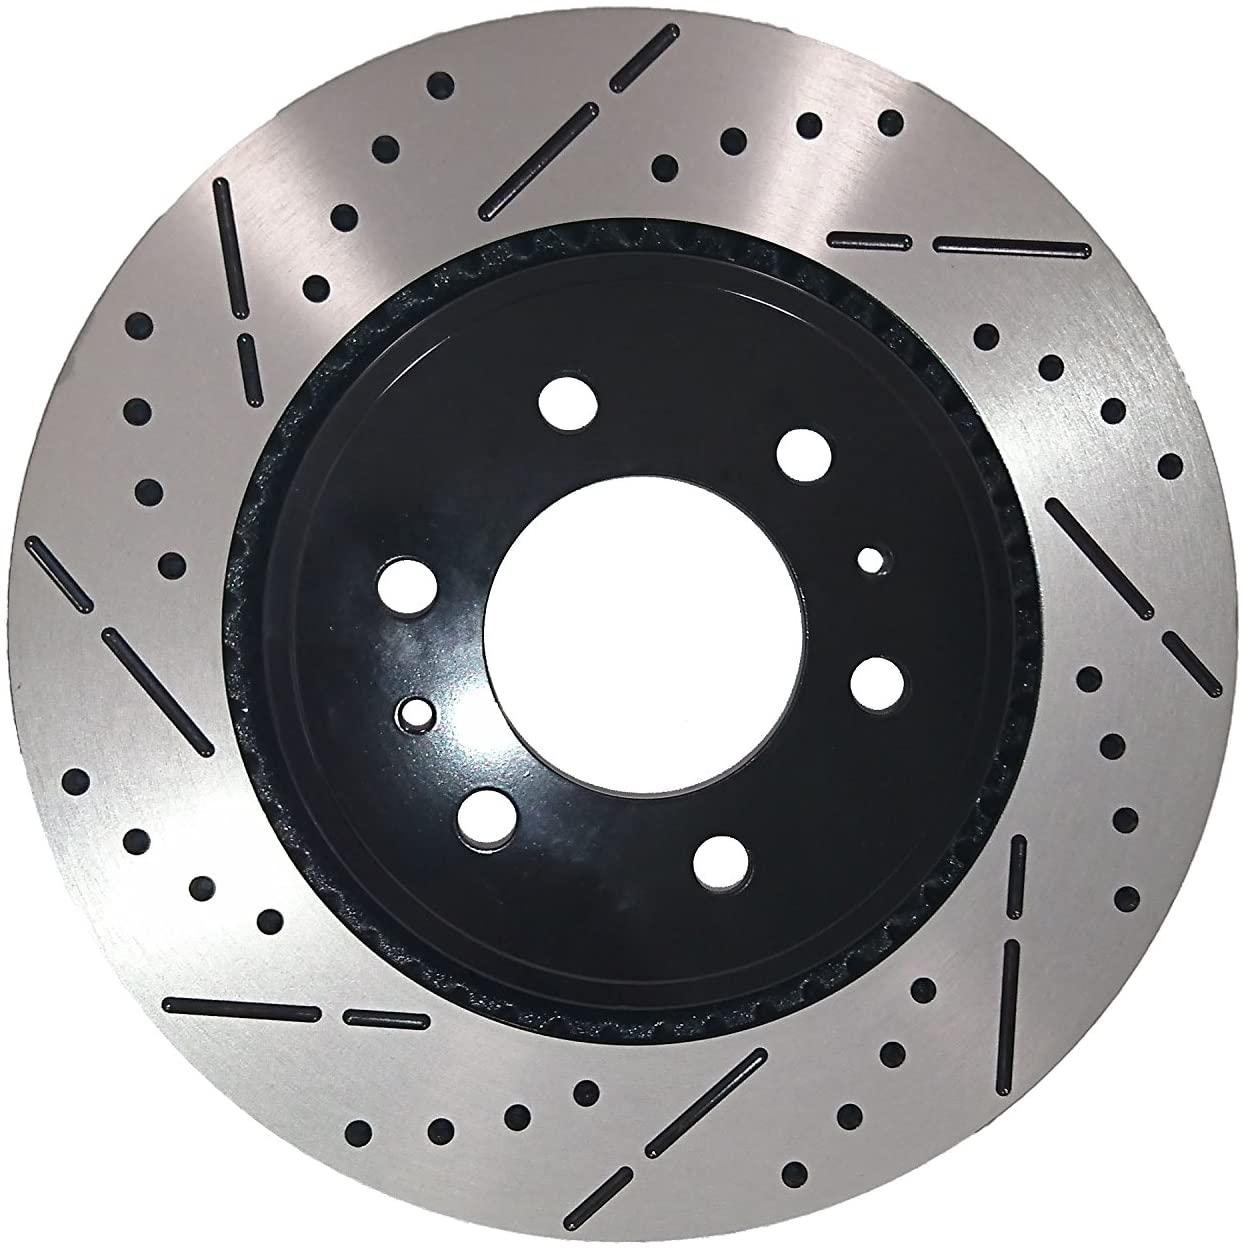 [Front E-Coat Drill&Slot Brake Rotors Ceramic Pads] Fit 08-14 Toyota FJ Cruiser